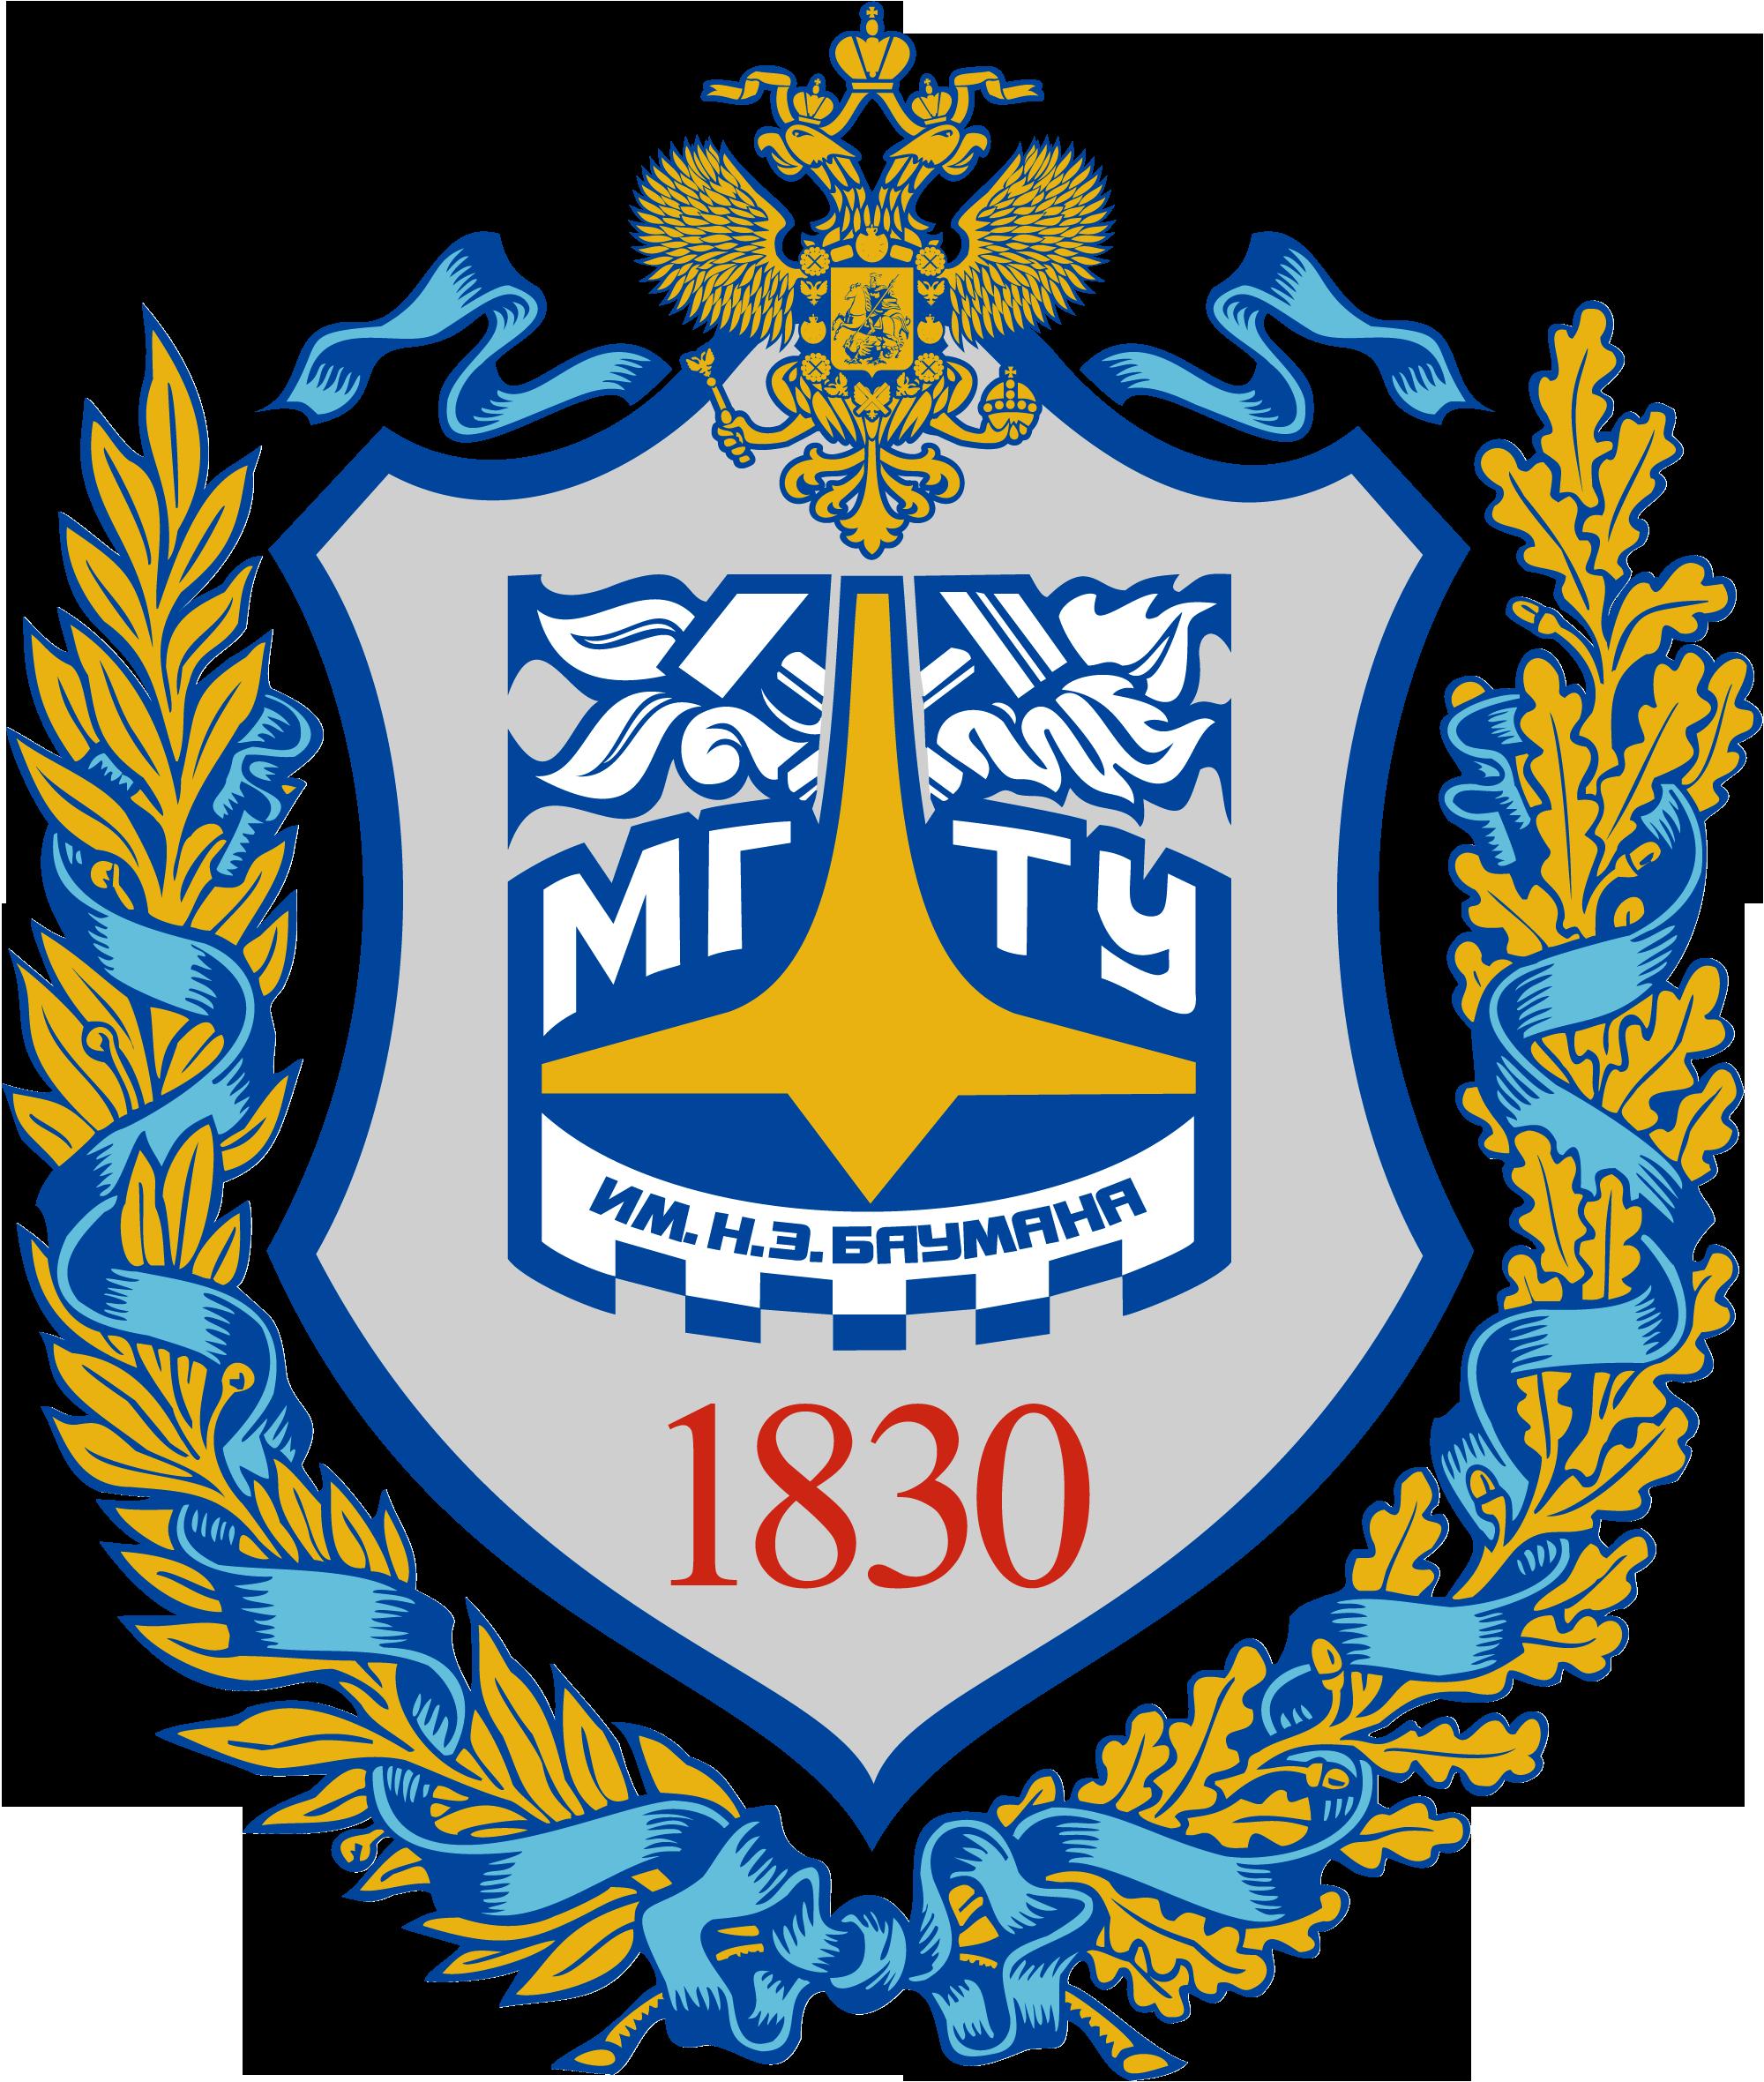 Герб МГТУ им. Н. Э. Баумана